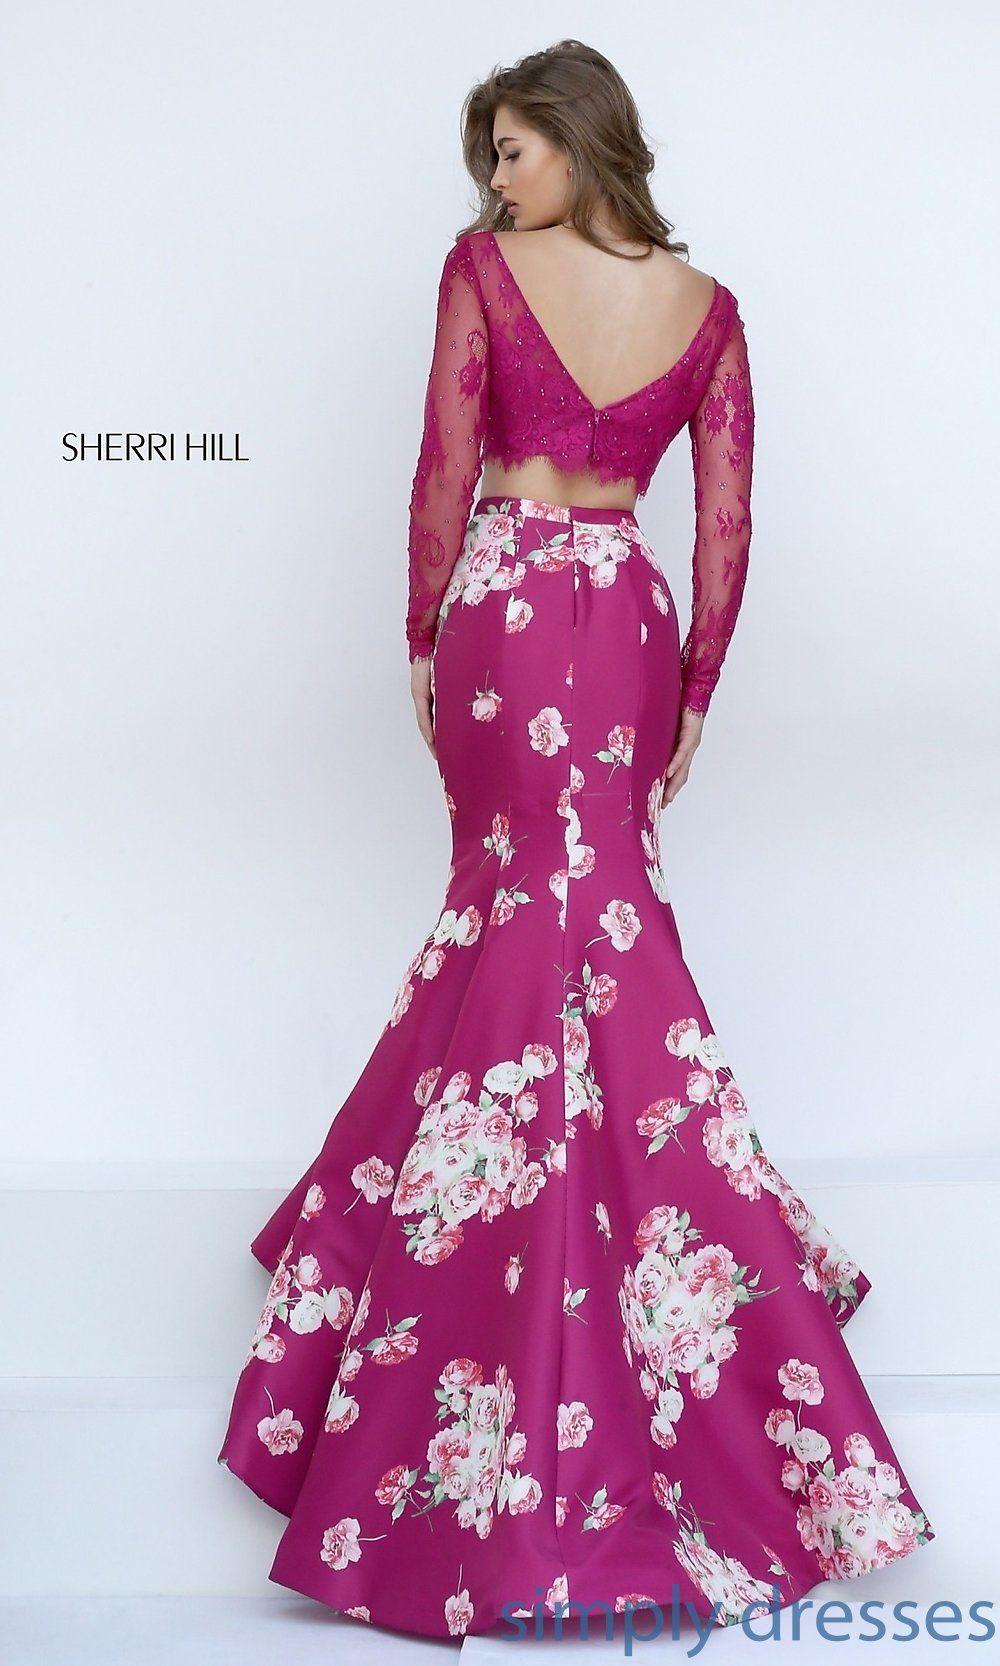 e42fb07ecc2 Shop Sherri Hill floral print two piece long prom dresses at SimplyDresses.  Beaded long sleeve crop top two piece dresses with long floral skirts.